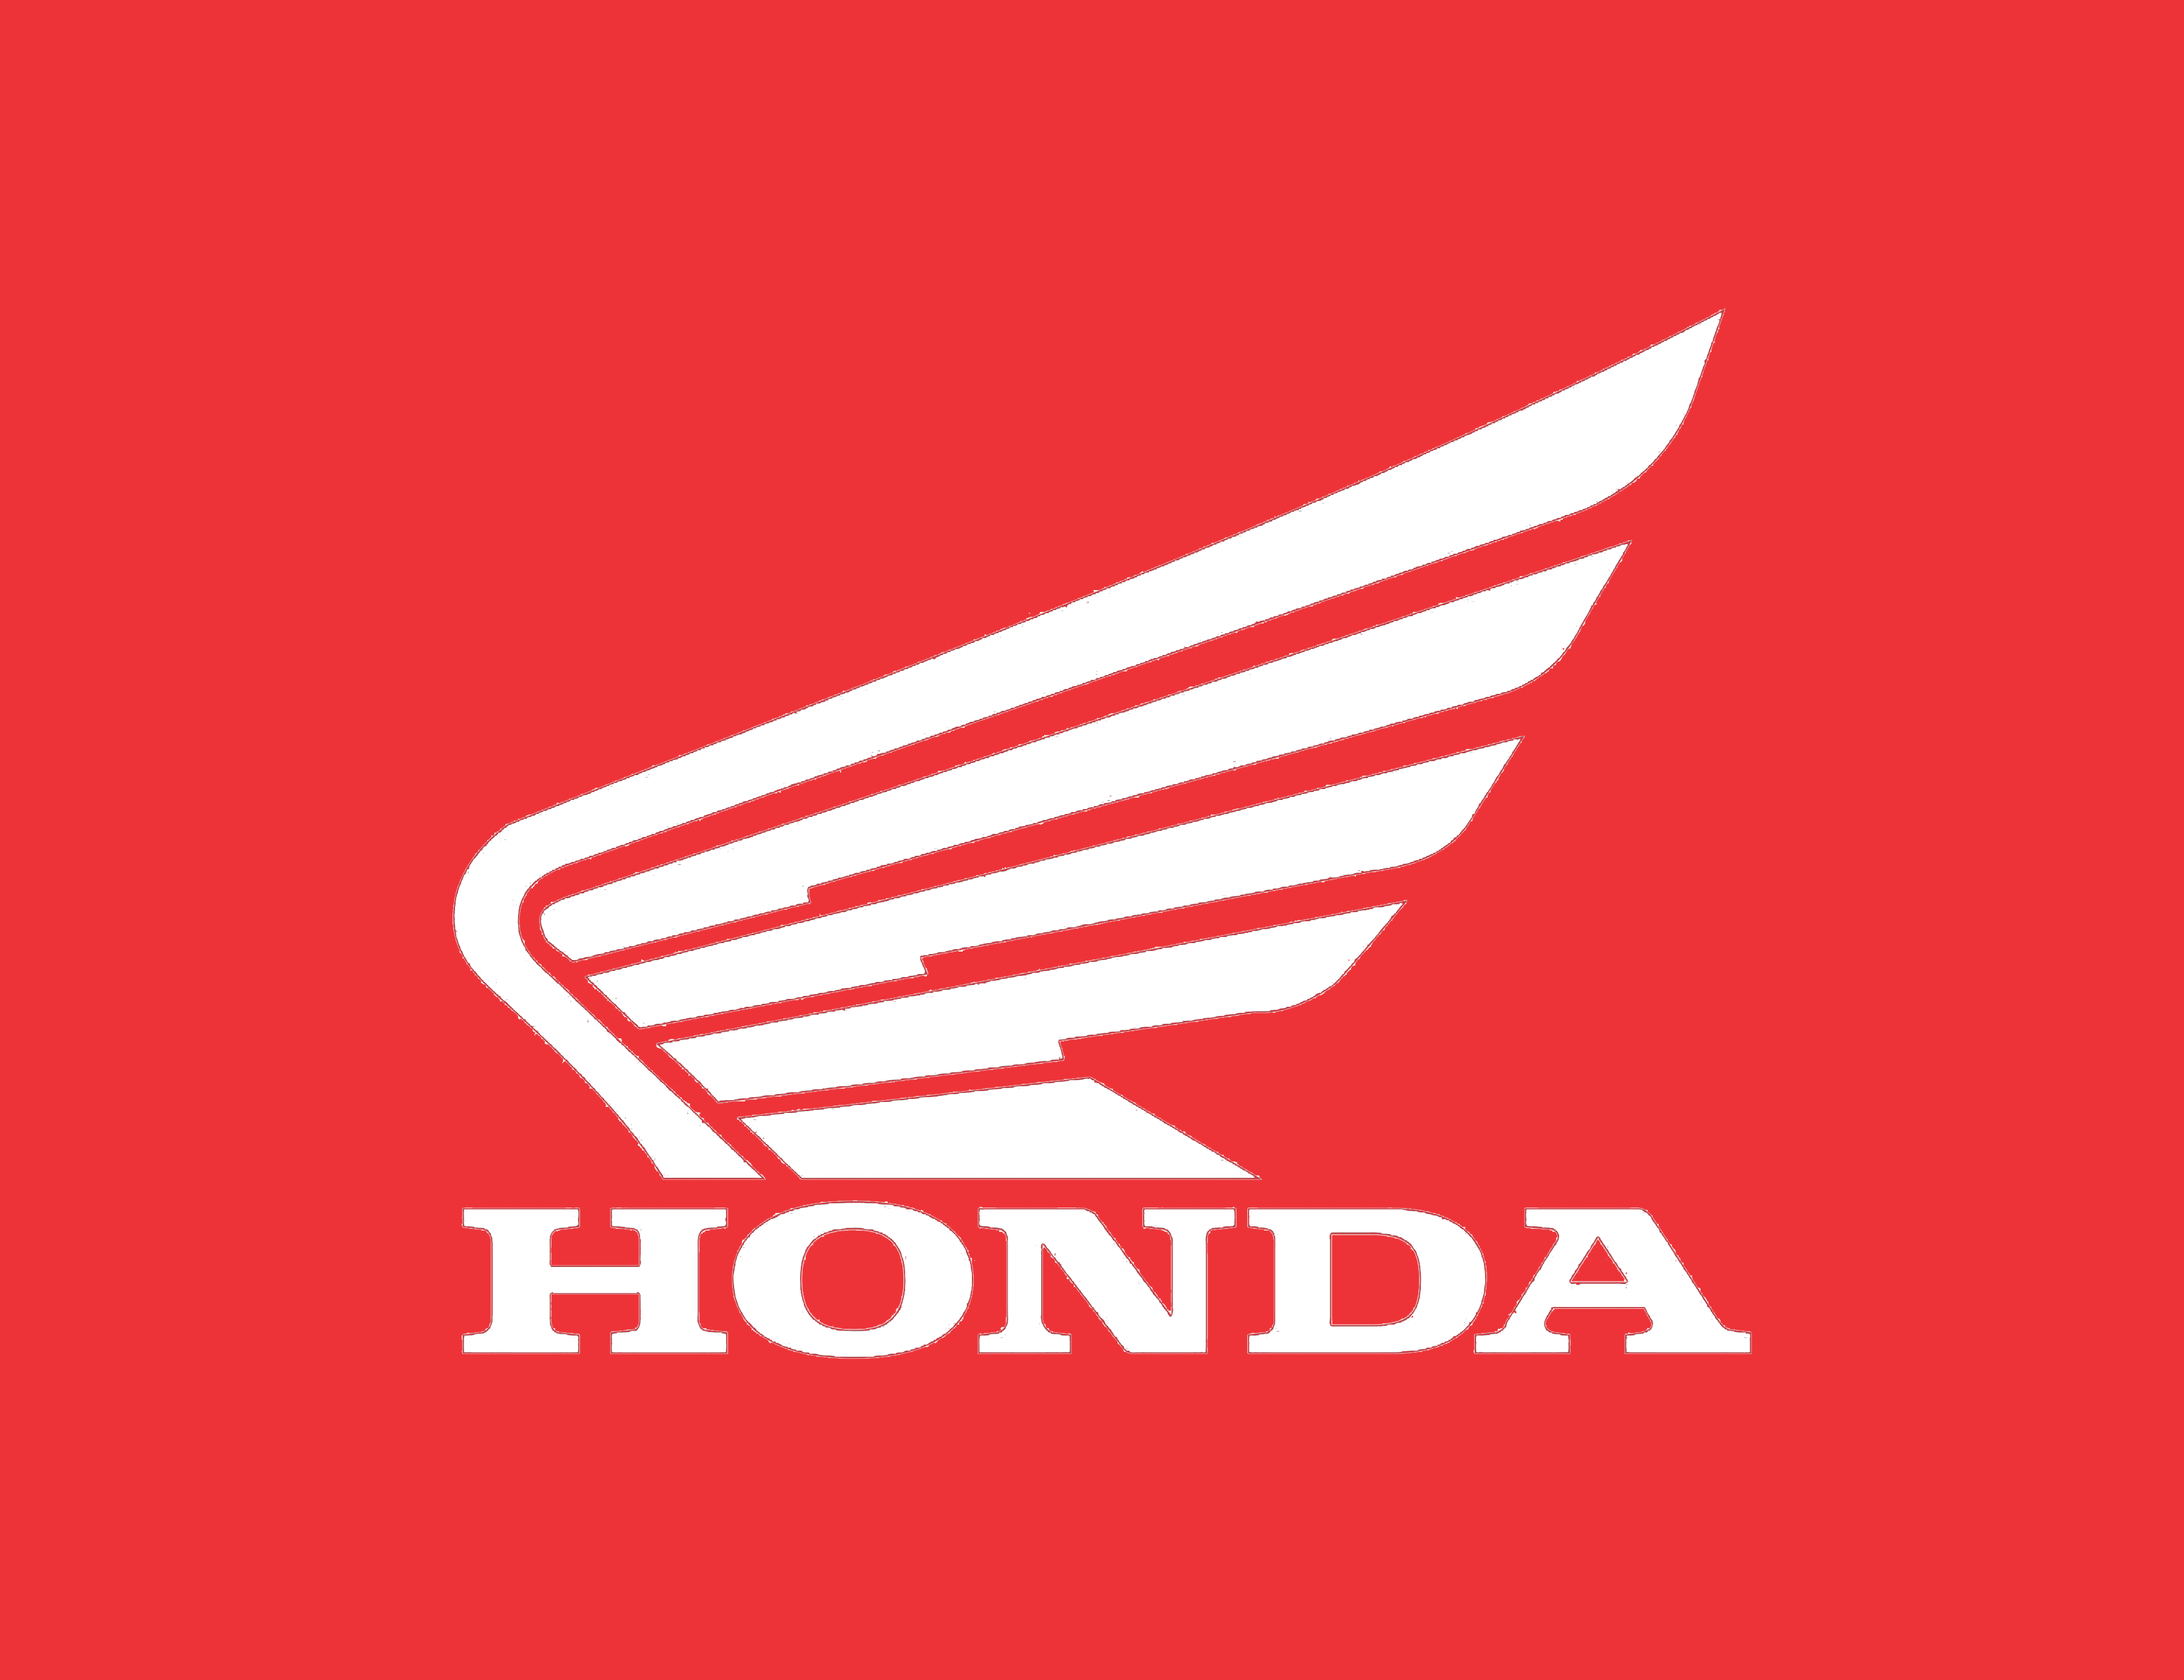 honda motorcycle logo logojoy rh logojoy com honda motorcycle logo font honda motorcycle logo vector